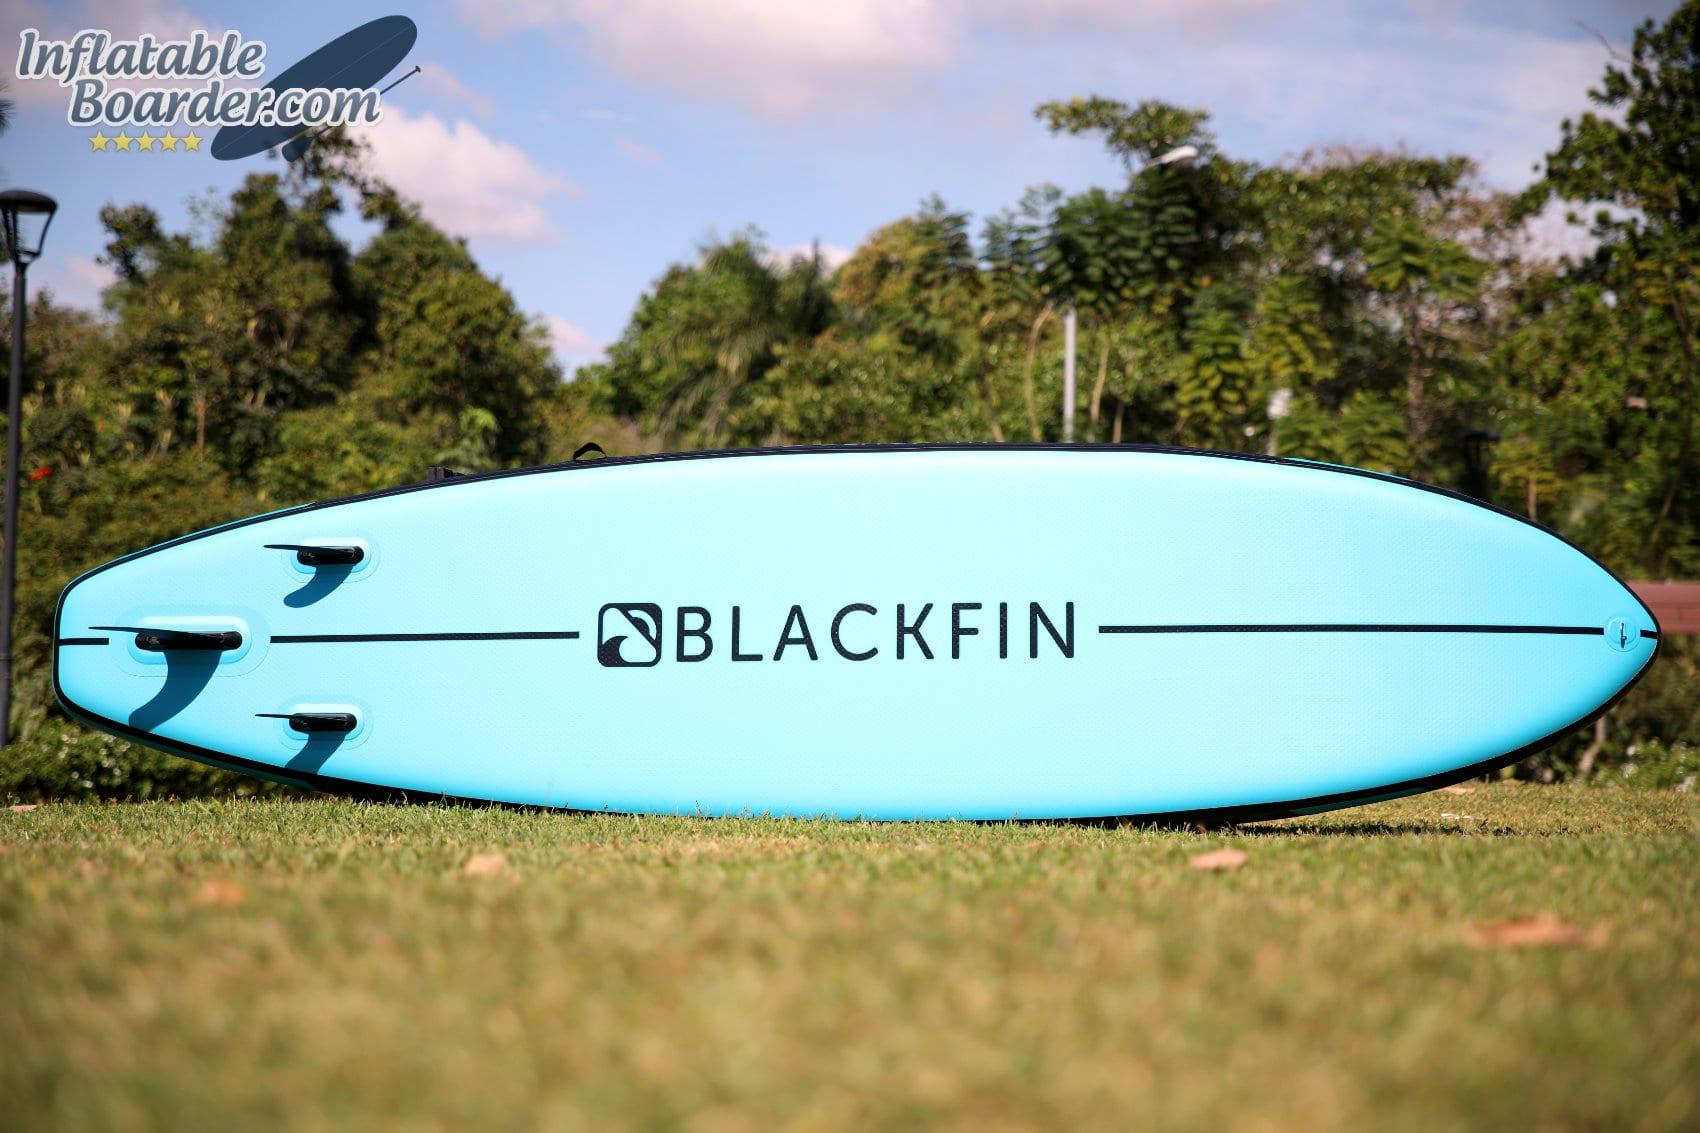 BLACKFIN Model XL Bottom